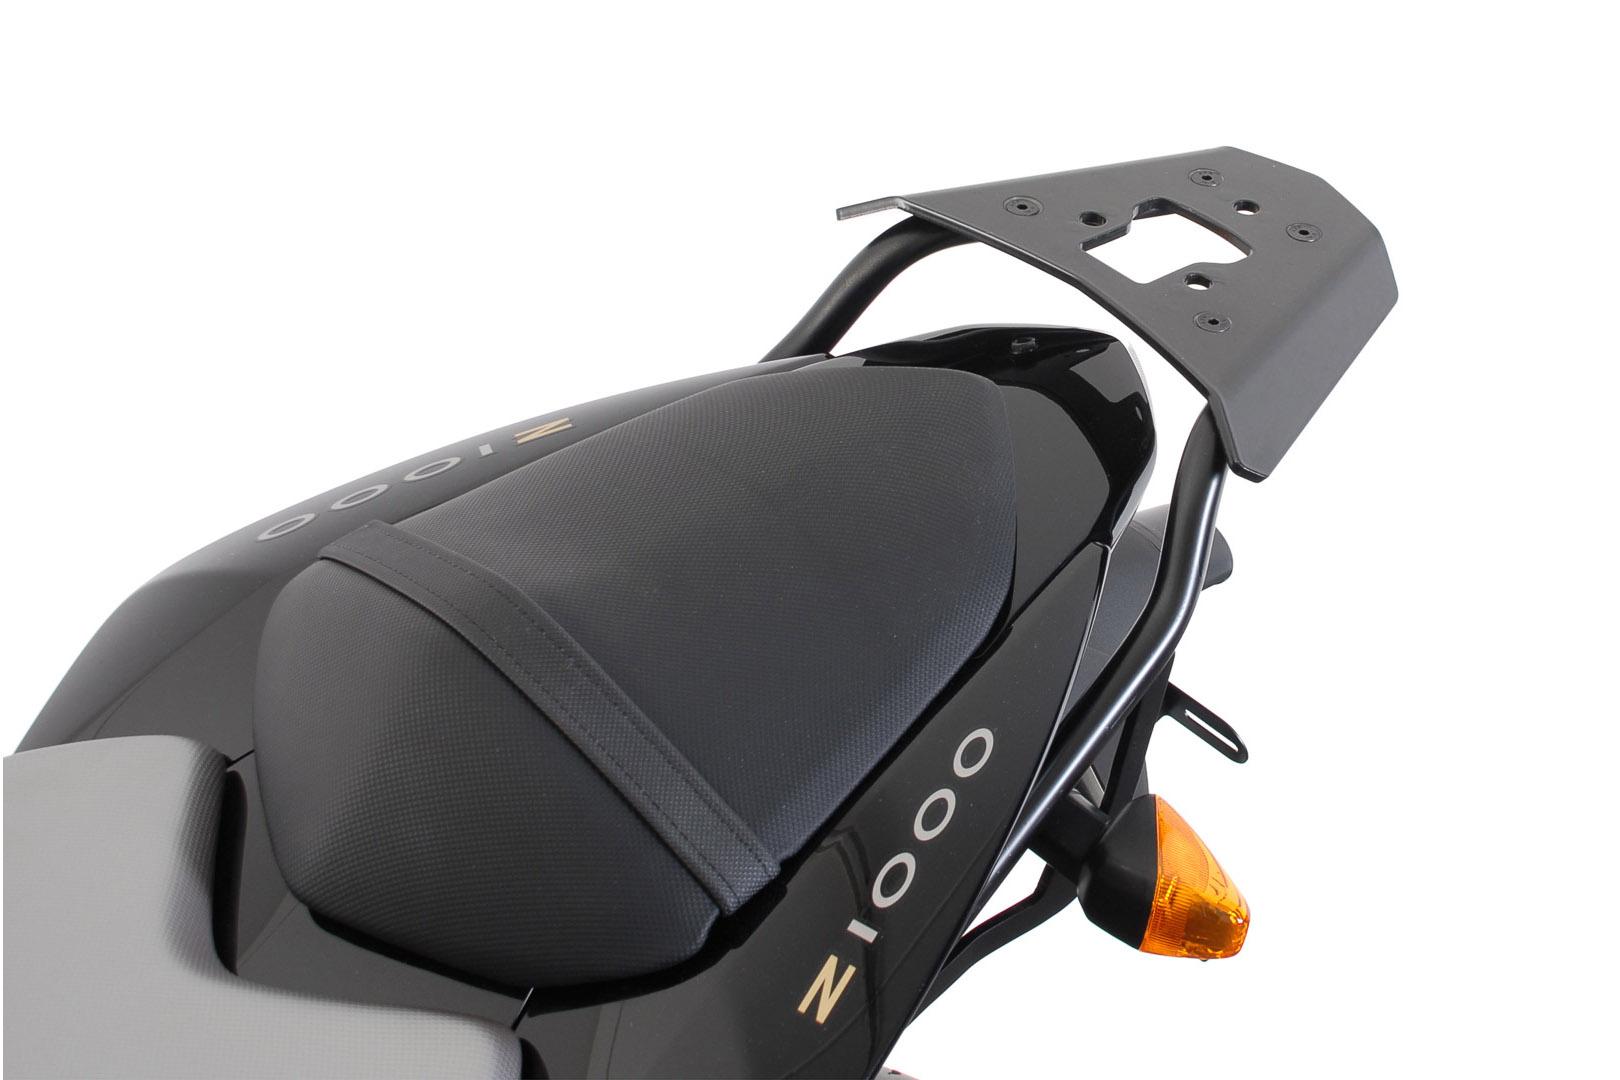 SW-Motech Alu-Rack peräteline Kawasaki Z750 07-/Z1000 07- 07-